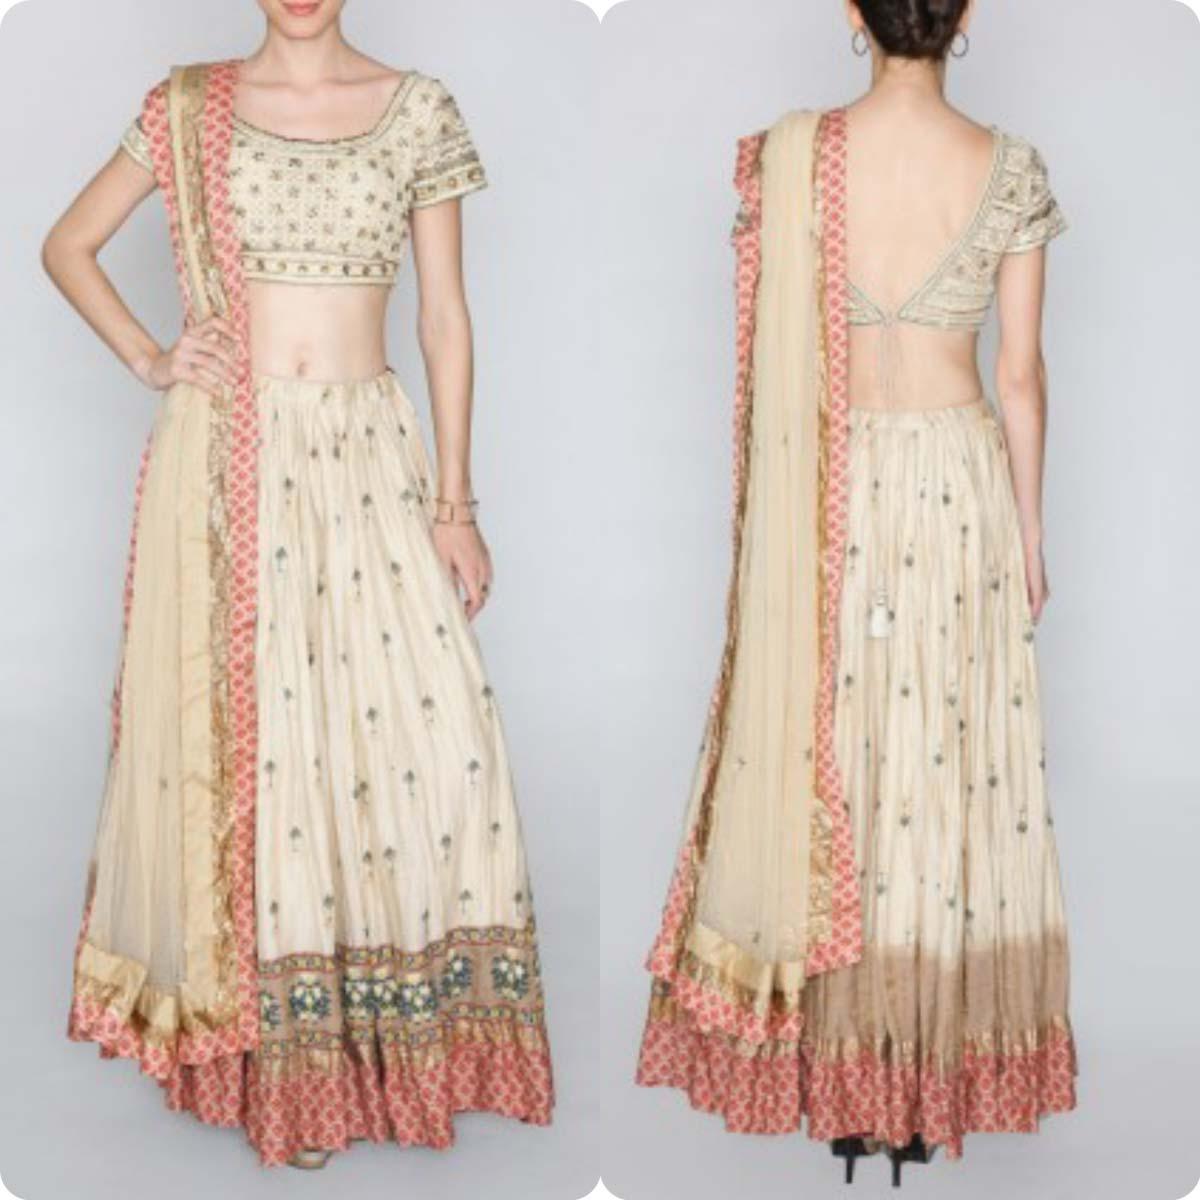 offwhite-embroidered-chanderi-lehenga-choli-and-dupatta